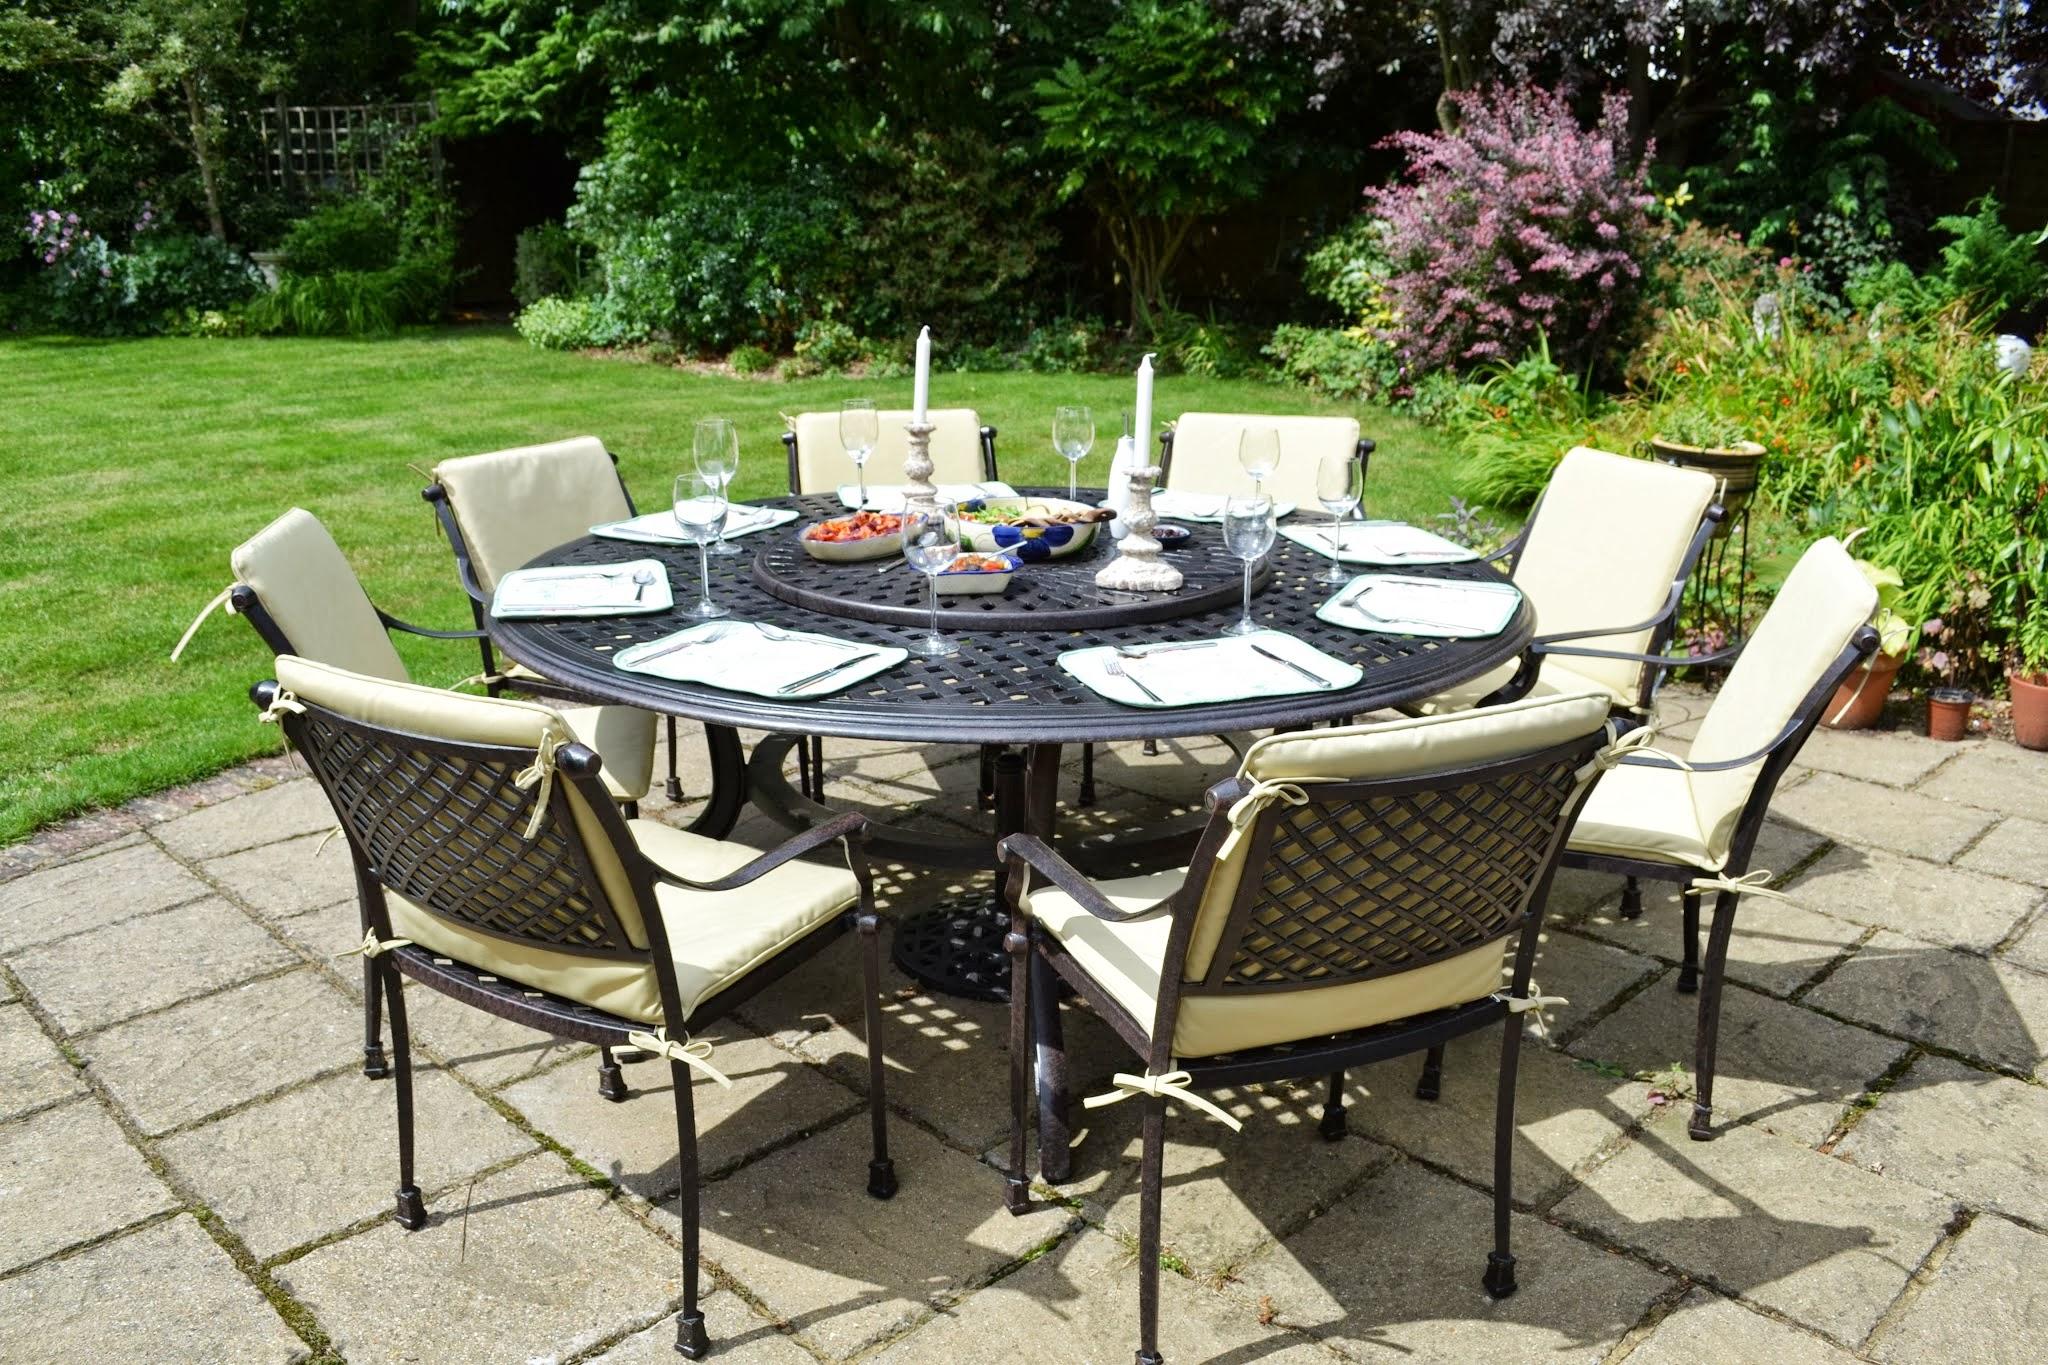 Jardin Table Jardin Tati De Table Tati De R54Laj pour Table De Jardin Ronde Pas Cher